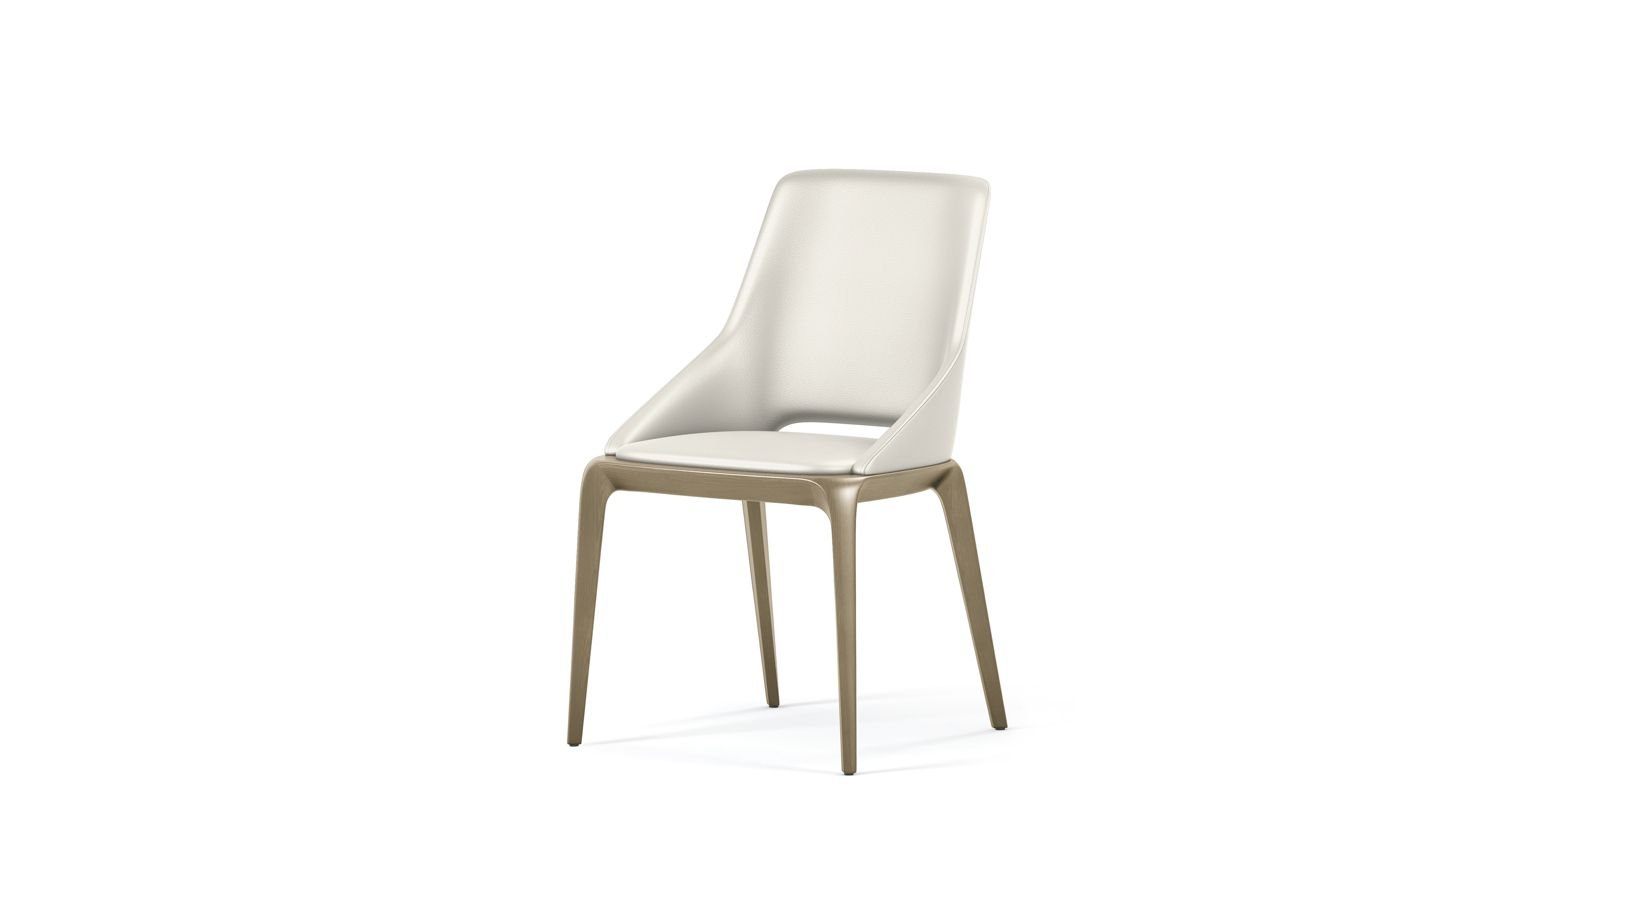 brio tabouret de bar roche bobois. Black Bedroom Furniture Sets. Home Design Ideas